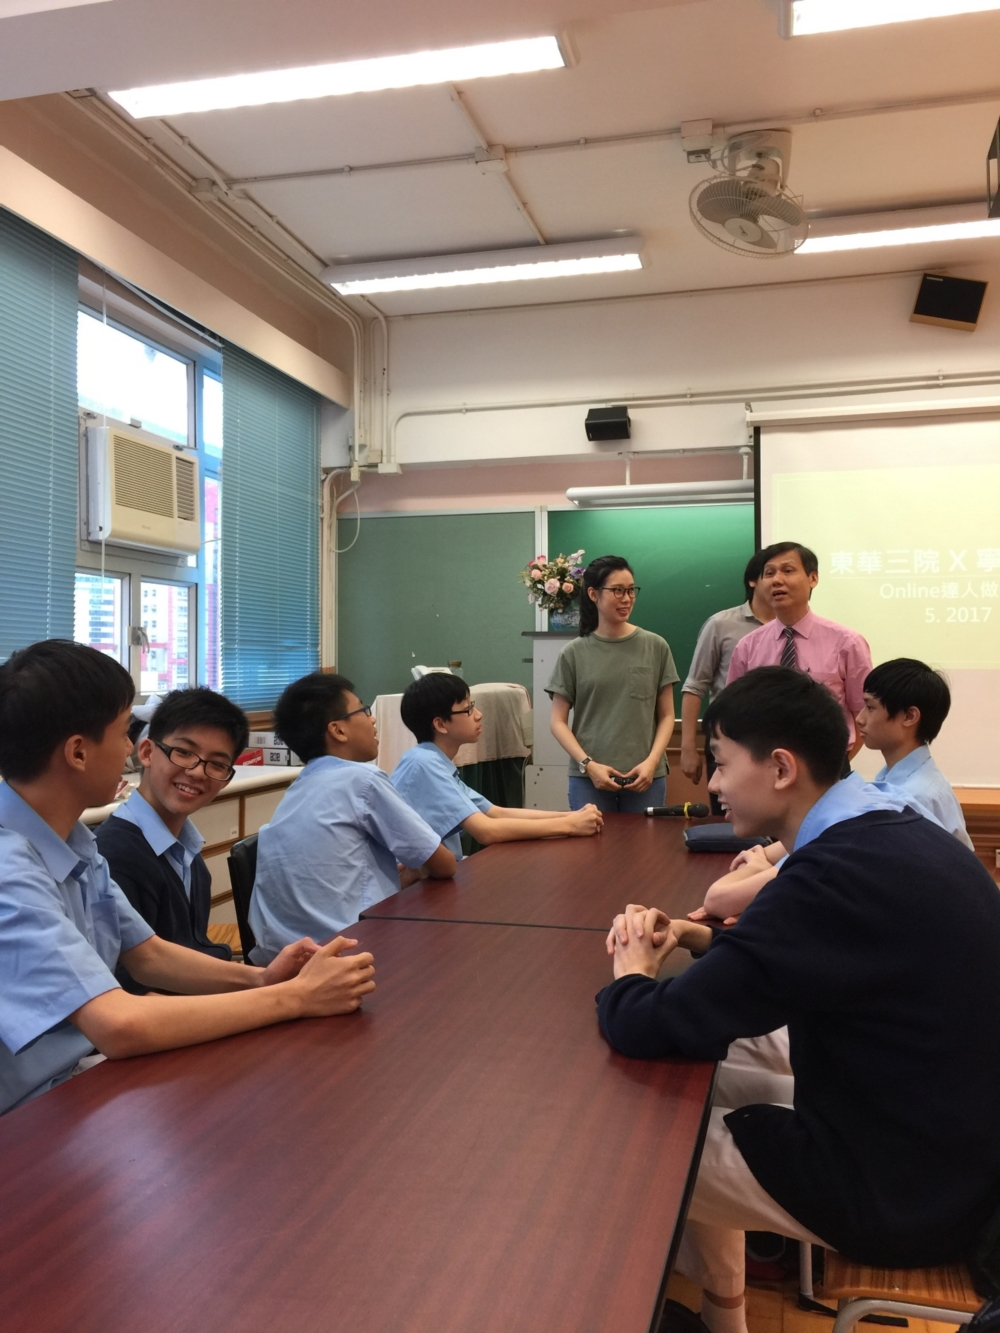 http://www.npc.edu.hk/sites/default/files/1_674.jpg